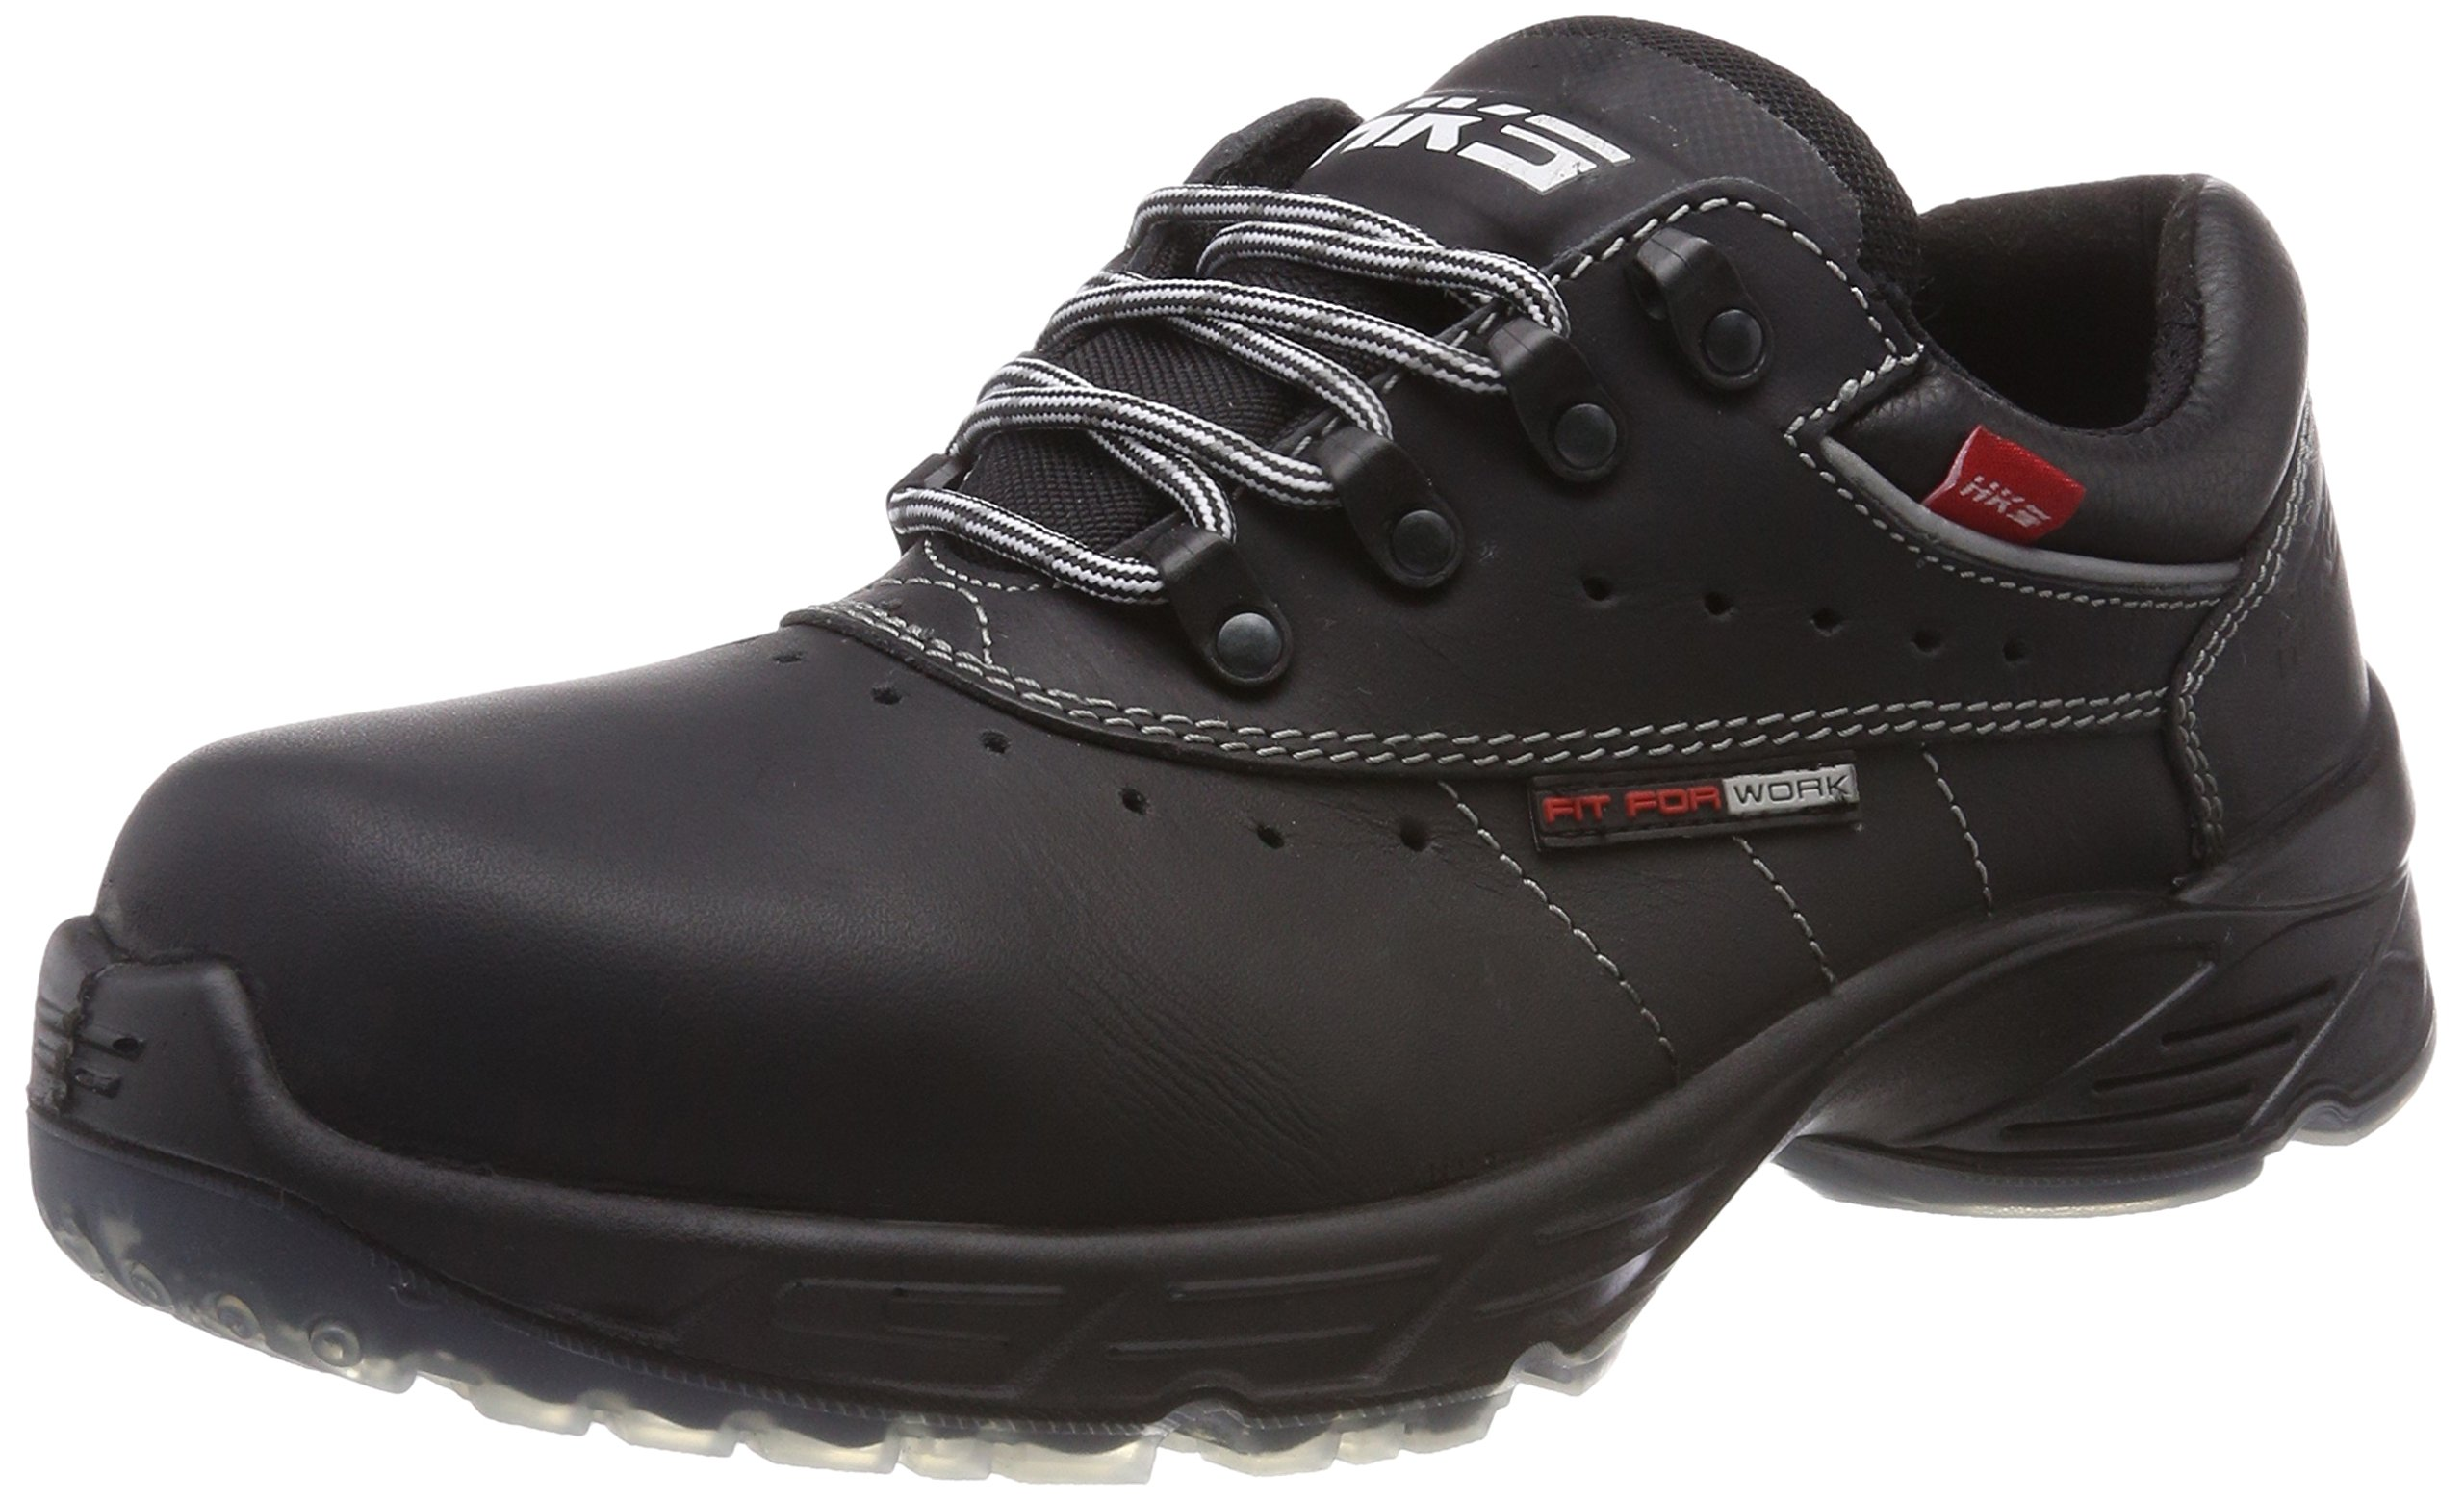 HKS Mens Safety Shoes- Buy Online in